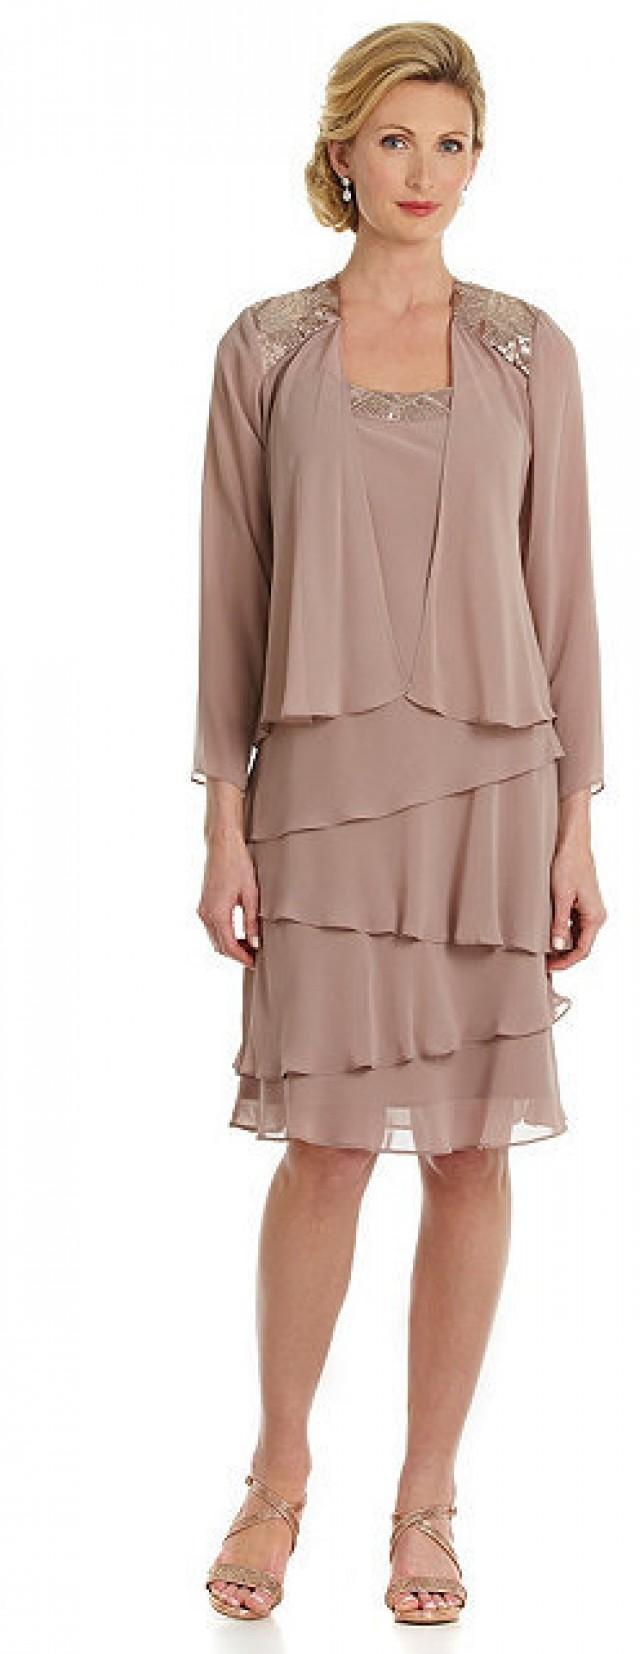 Sl sl fashion dresses - Sl Sl Fashion Dresses 17